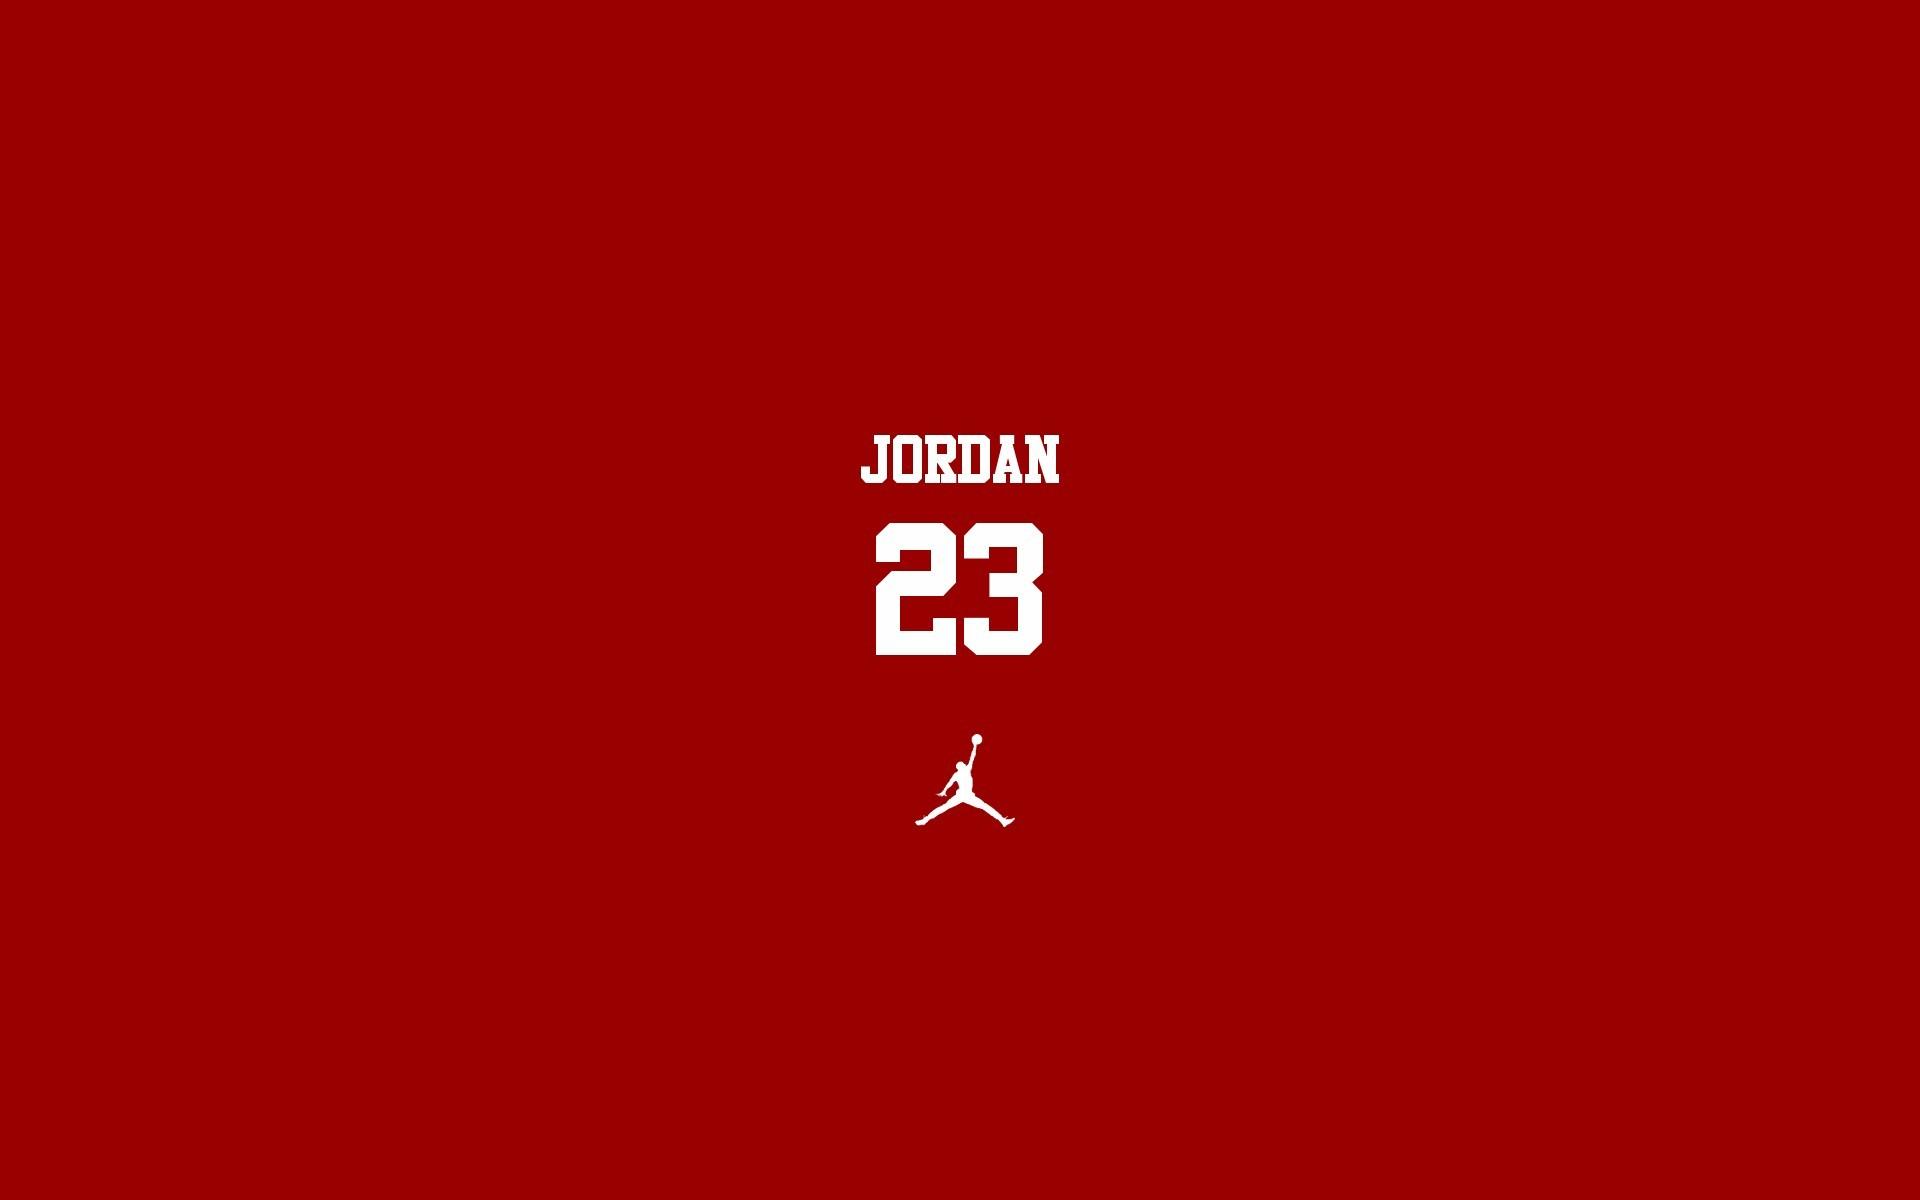 Must see Wallpaper Logo Michael Jordan - sport-simple-background-minimalism-red-text-numbers-logo-red-background-circle-basketball-brand-Michael-Jordan-line-screenshot-computer-wallpaper-font-227483  You Should Have_25379.jpg